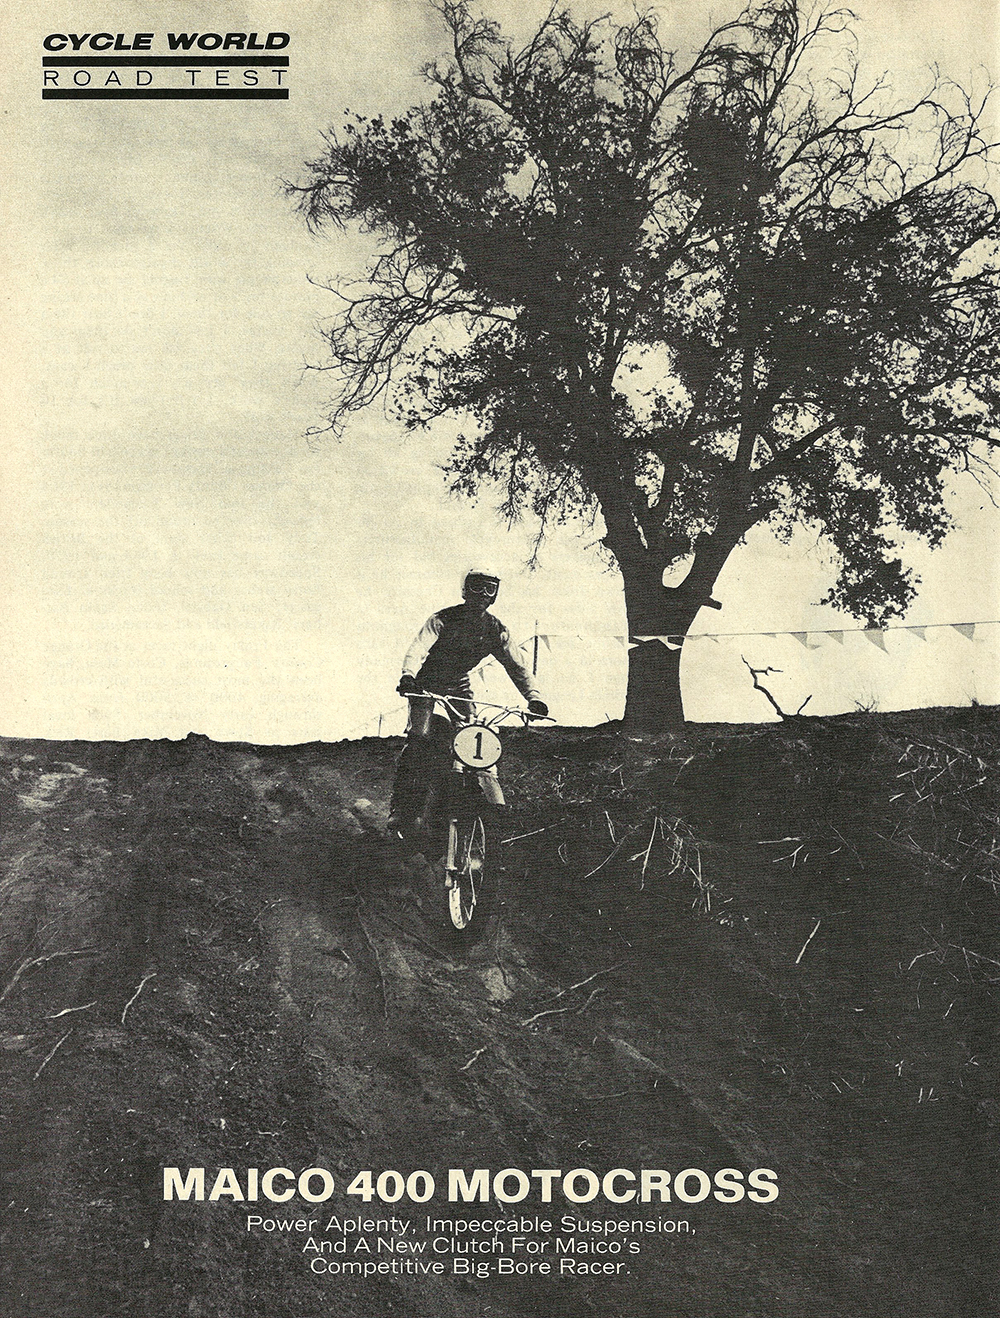 1971 Maico 400 Motocross road test 01.jpg